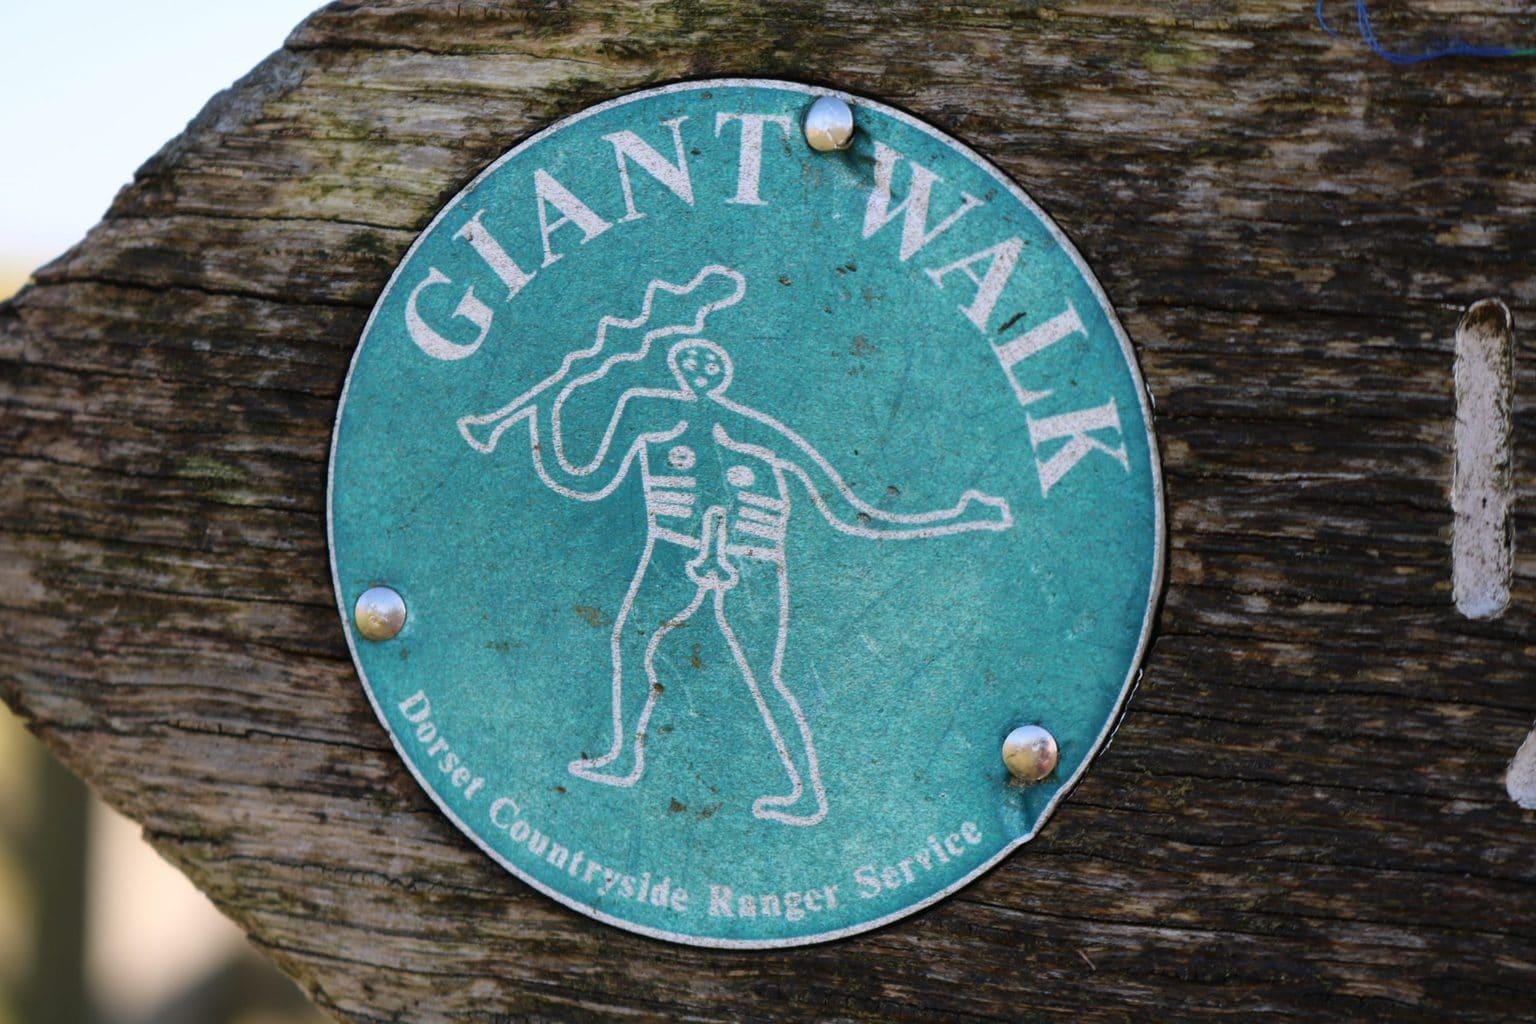 Cerne Abbas Giant Walk Waymarker